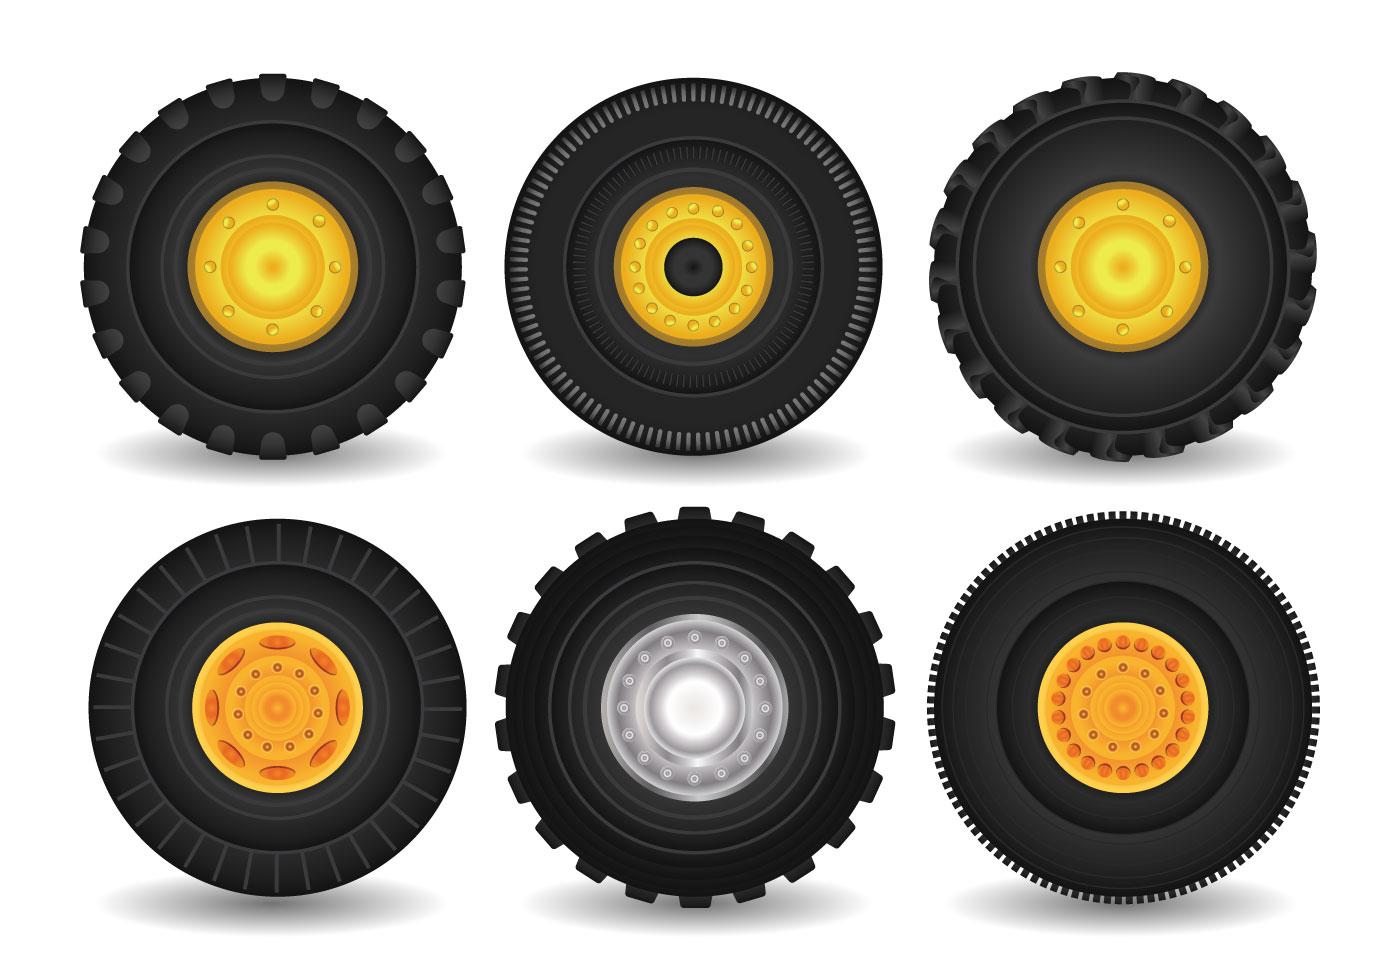 Clip Art Tractor Wheels : Tractor tire vector download free art stock